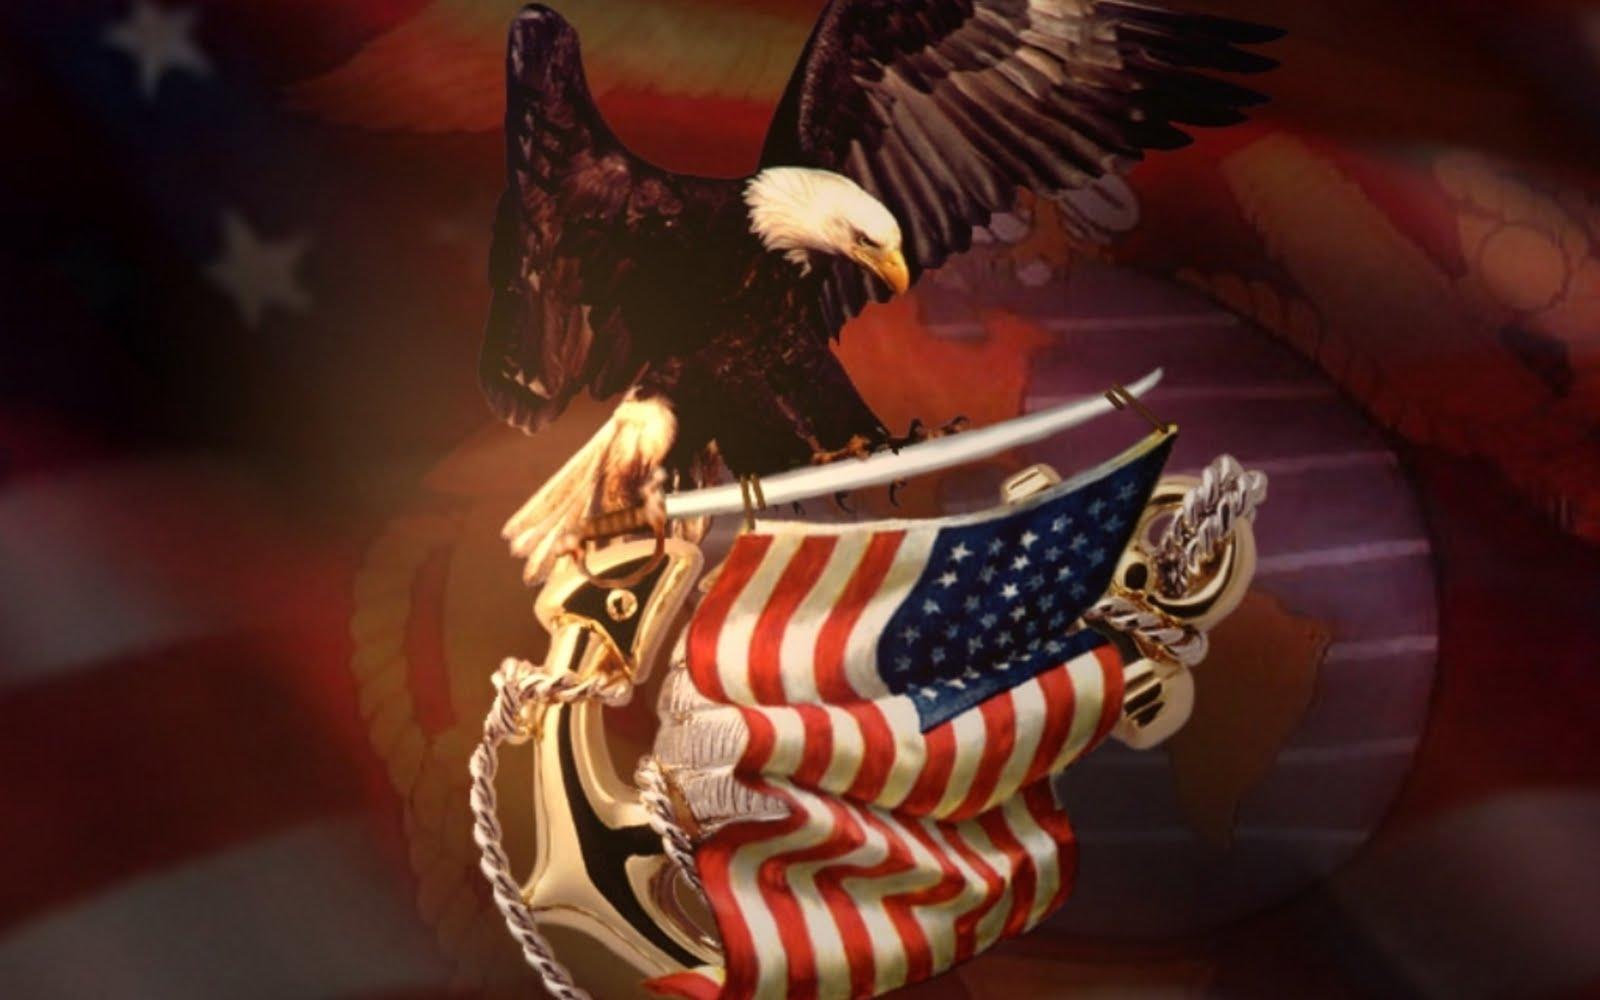 http://1.bp.blogspot.com/-iMRHDRb6yQ4/TfplbcIk5mI/AAAAAAAAGao/po24ihjDR5A/s1600/301875-1920x1200-American-Pride-military-4300781-1024-768.jpg